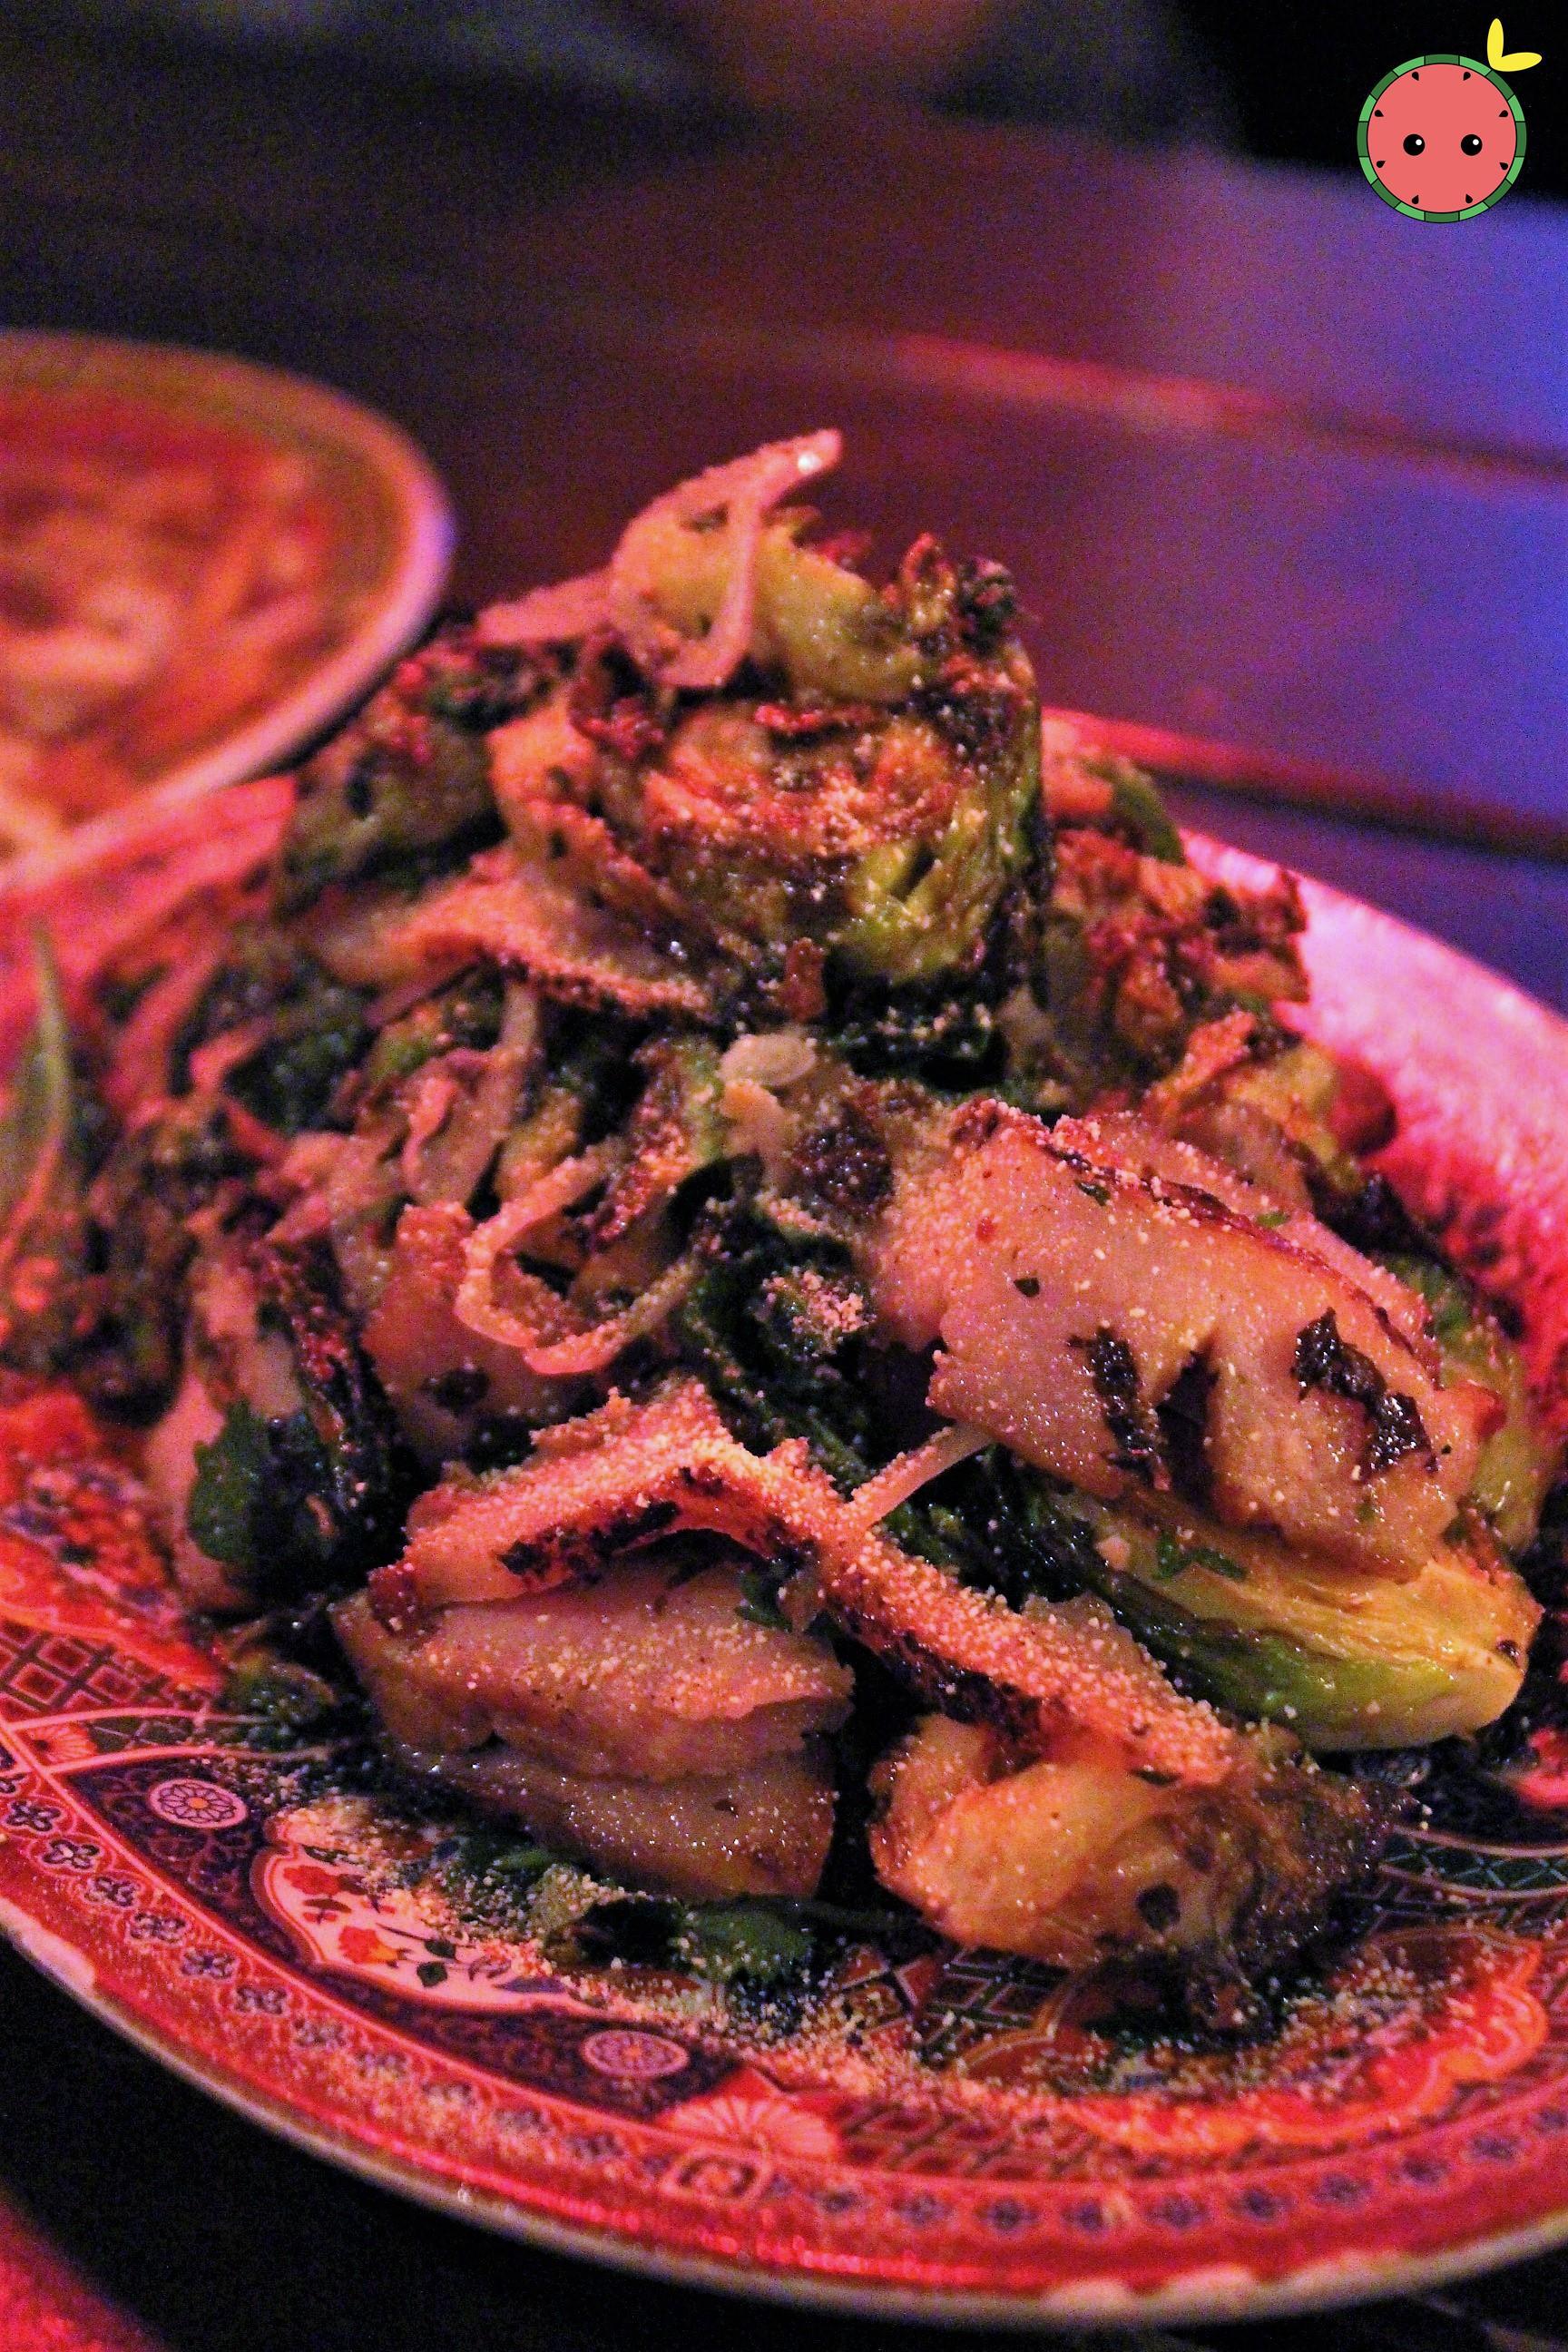 Grilled Pork Jowl